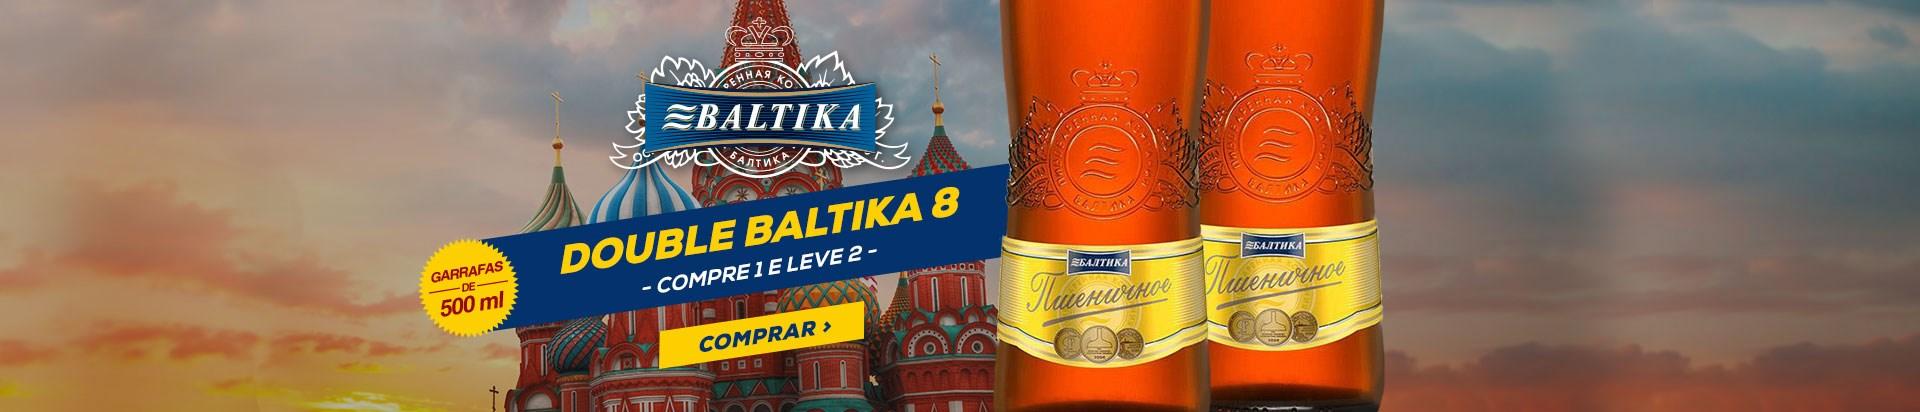 Double Baltika 8